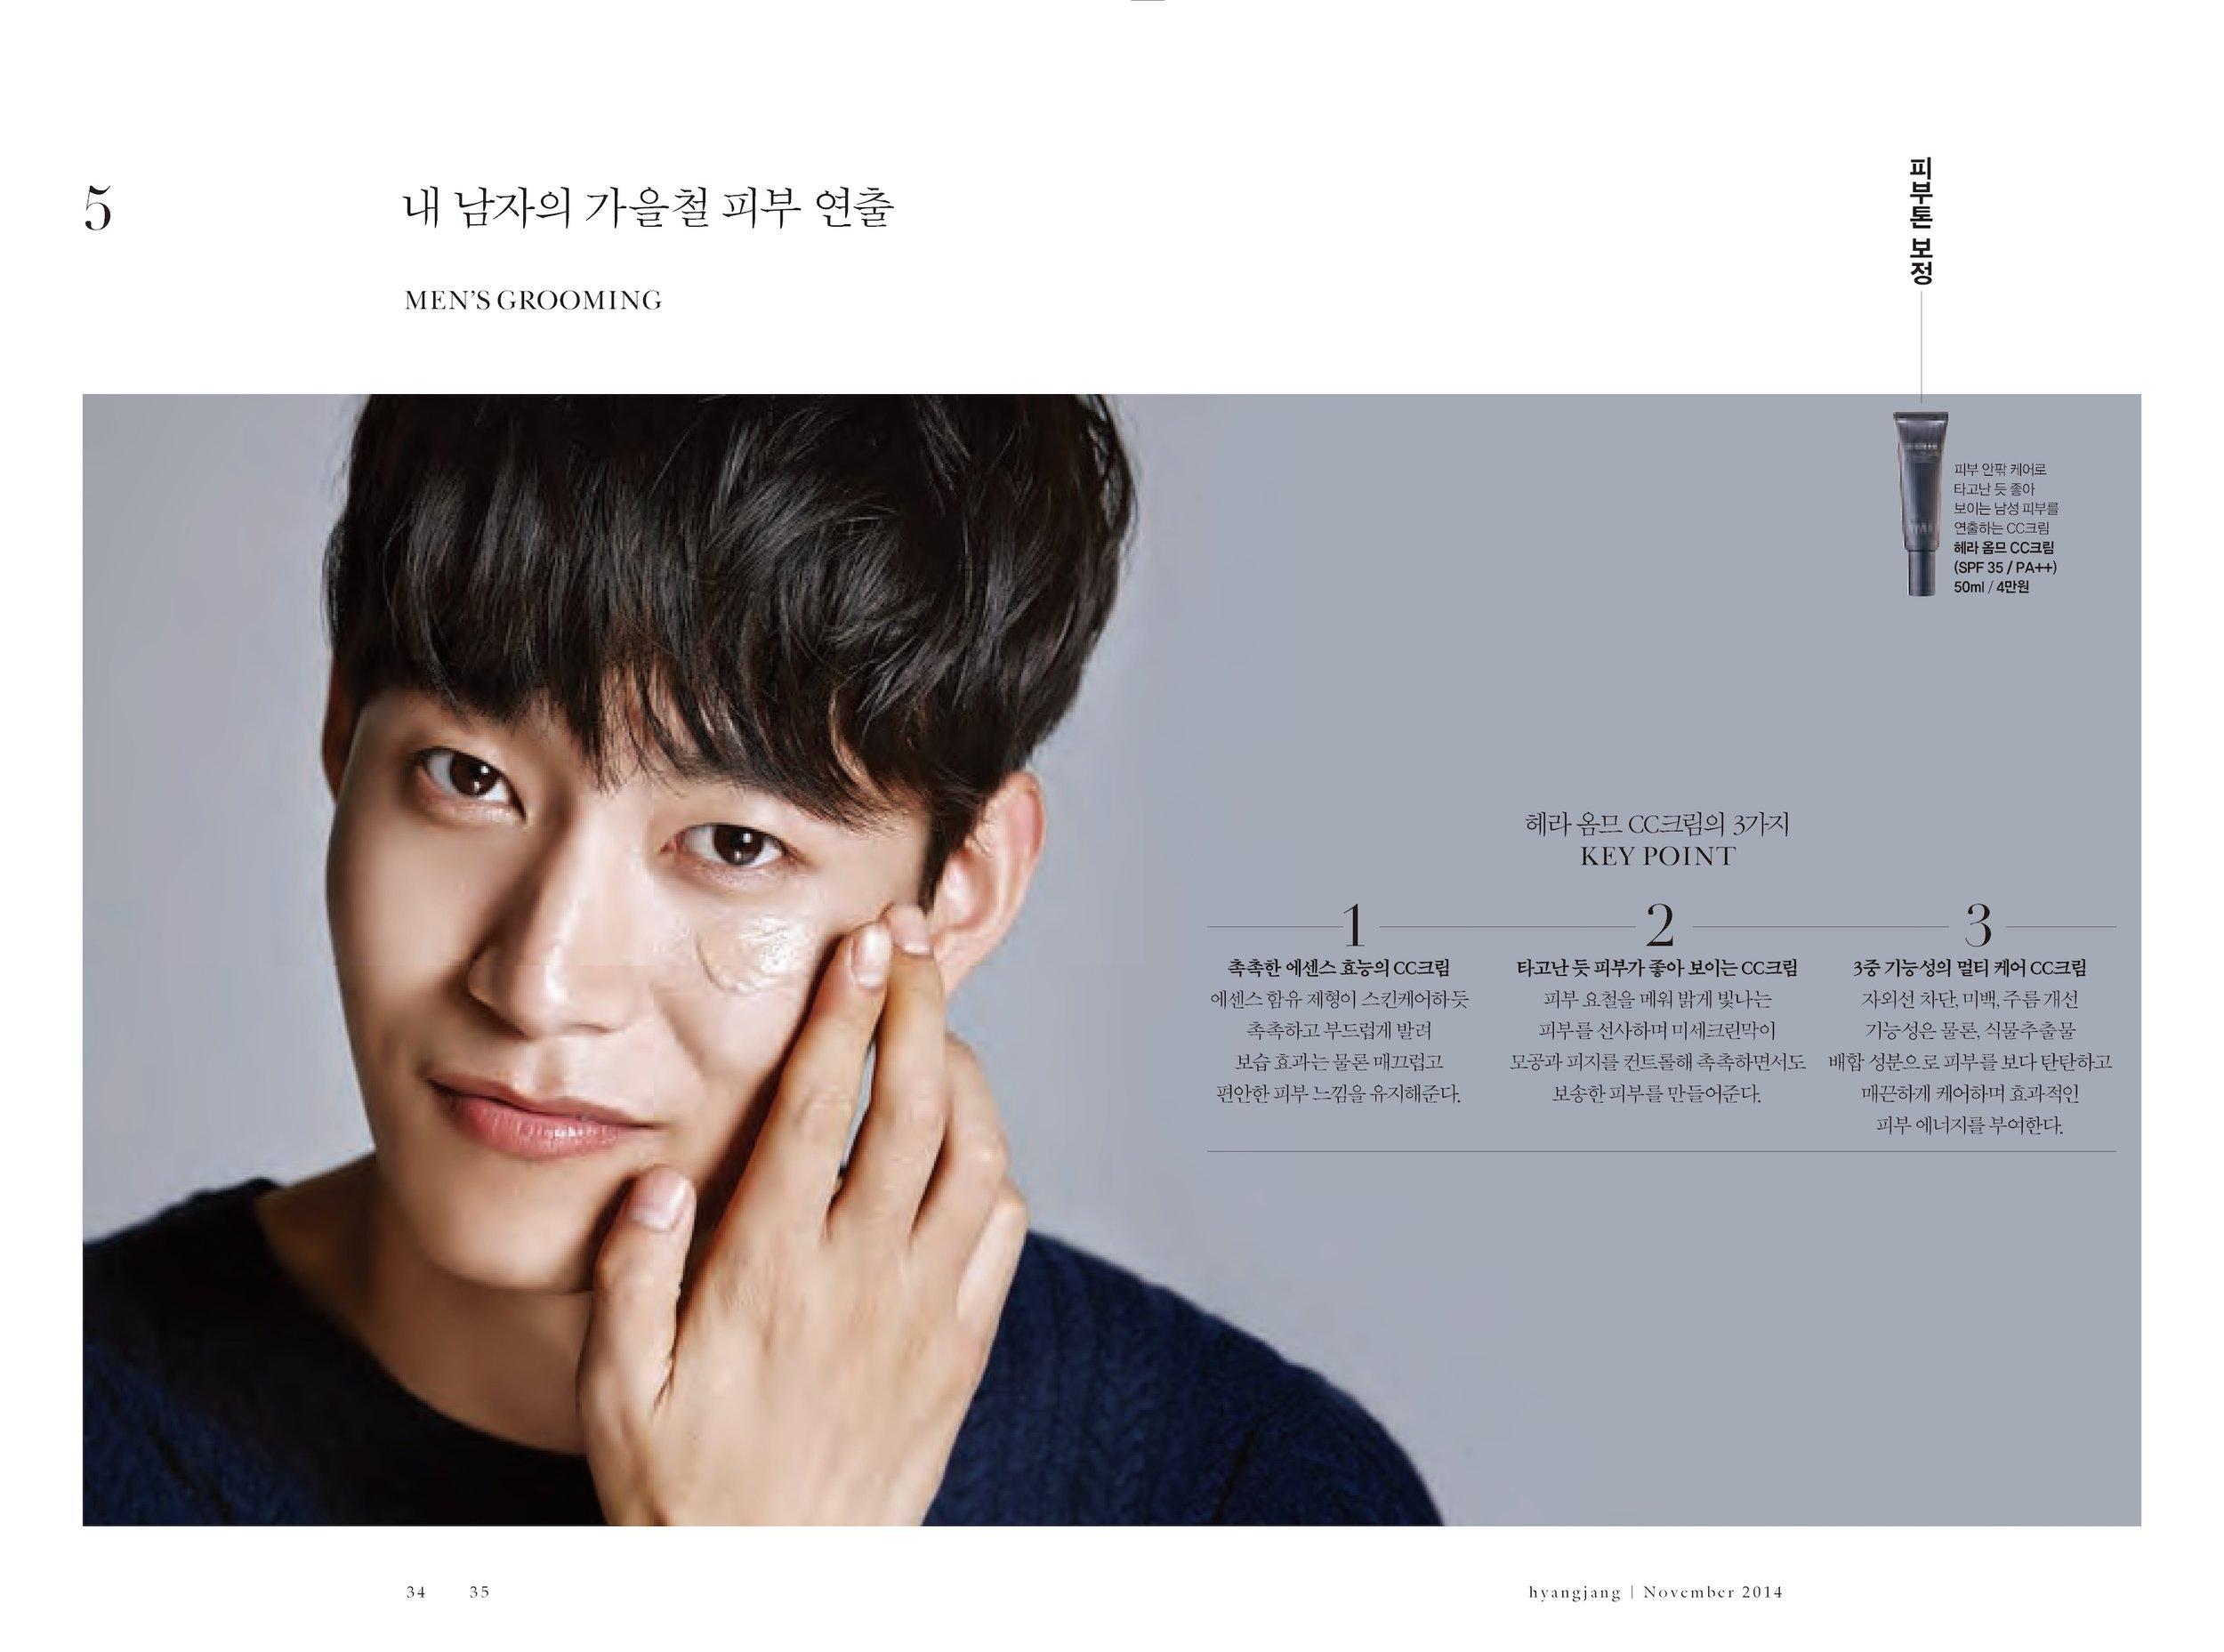 hyangjang-201411_페이지_18.jpeg